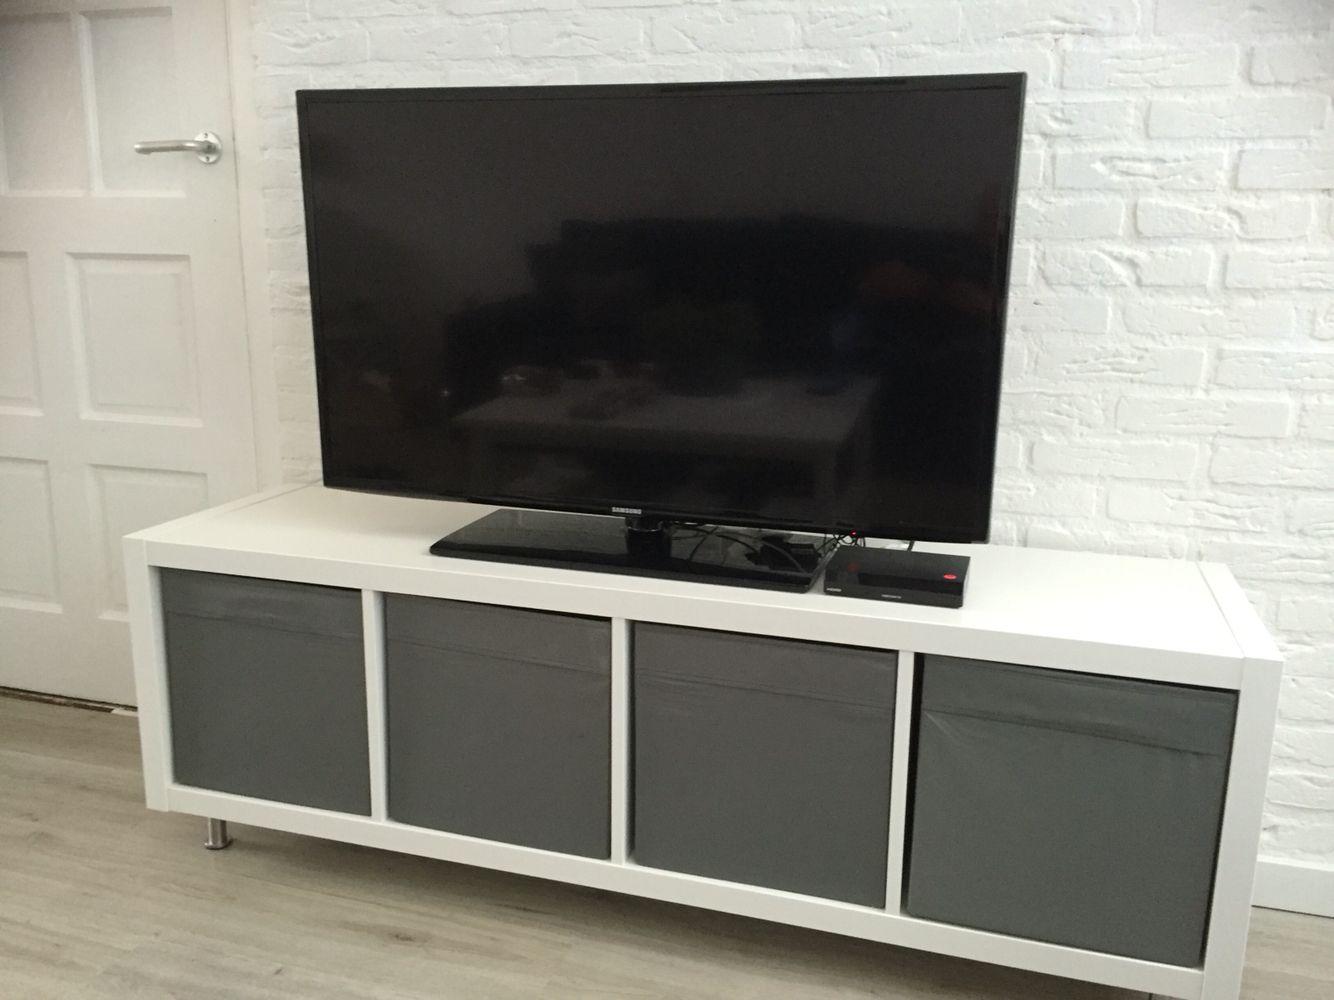 Ikea Kallax Kast : Van een ikea kallax kast een tv meubel gemaakt kallax